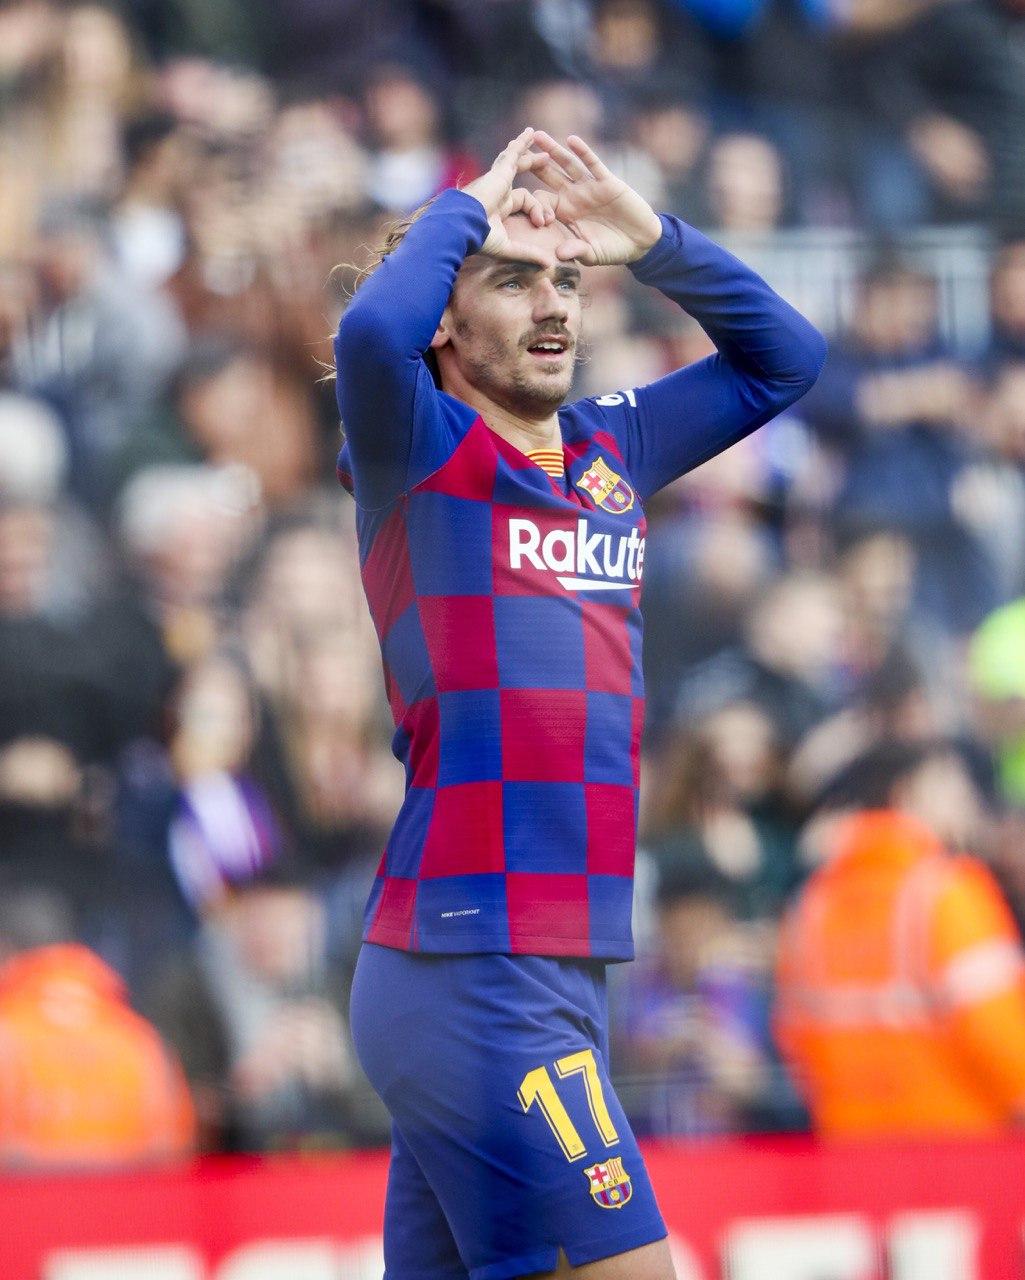 La contundencia del Barcelona le ganó 2-1 a un muy buen Getafe